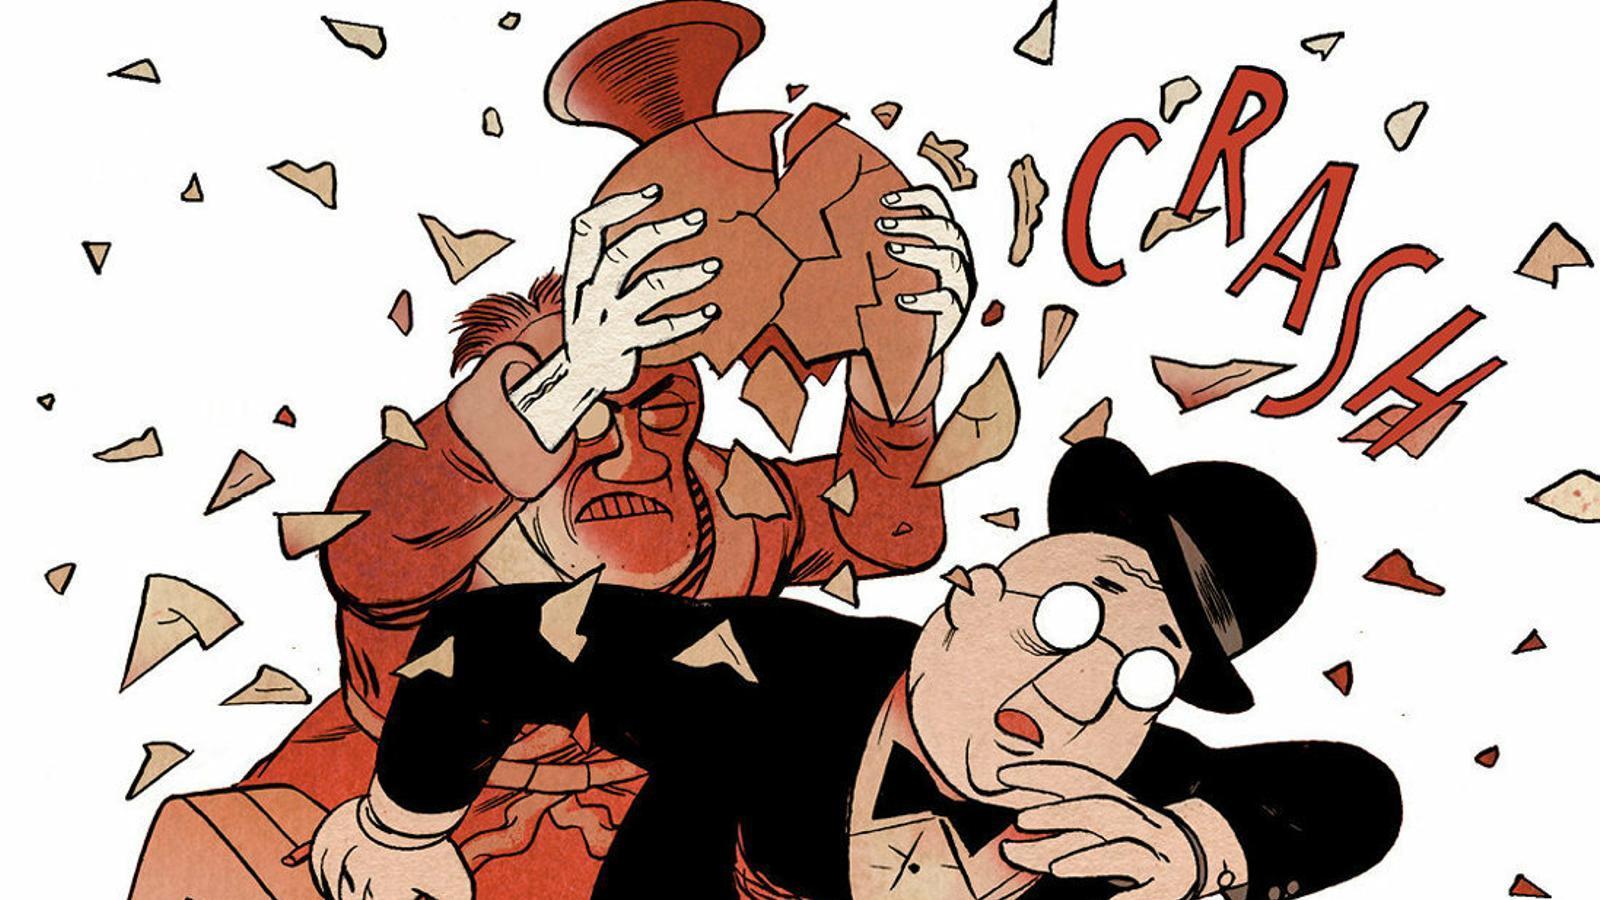 Crítica del còmic 'Inframundo', de Pep Brocal